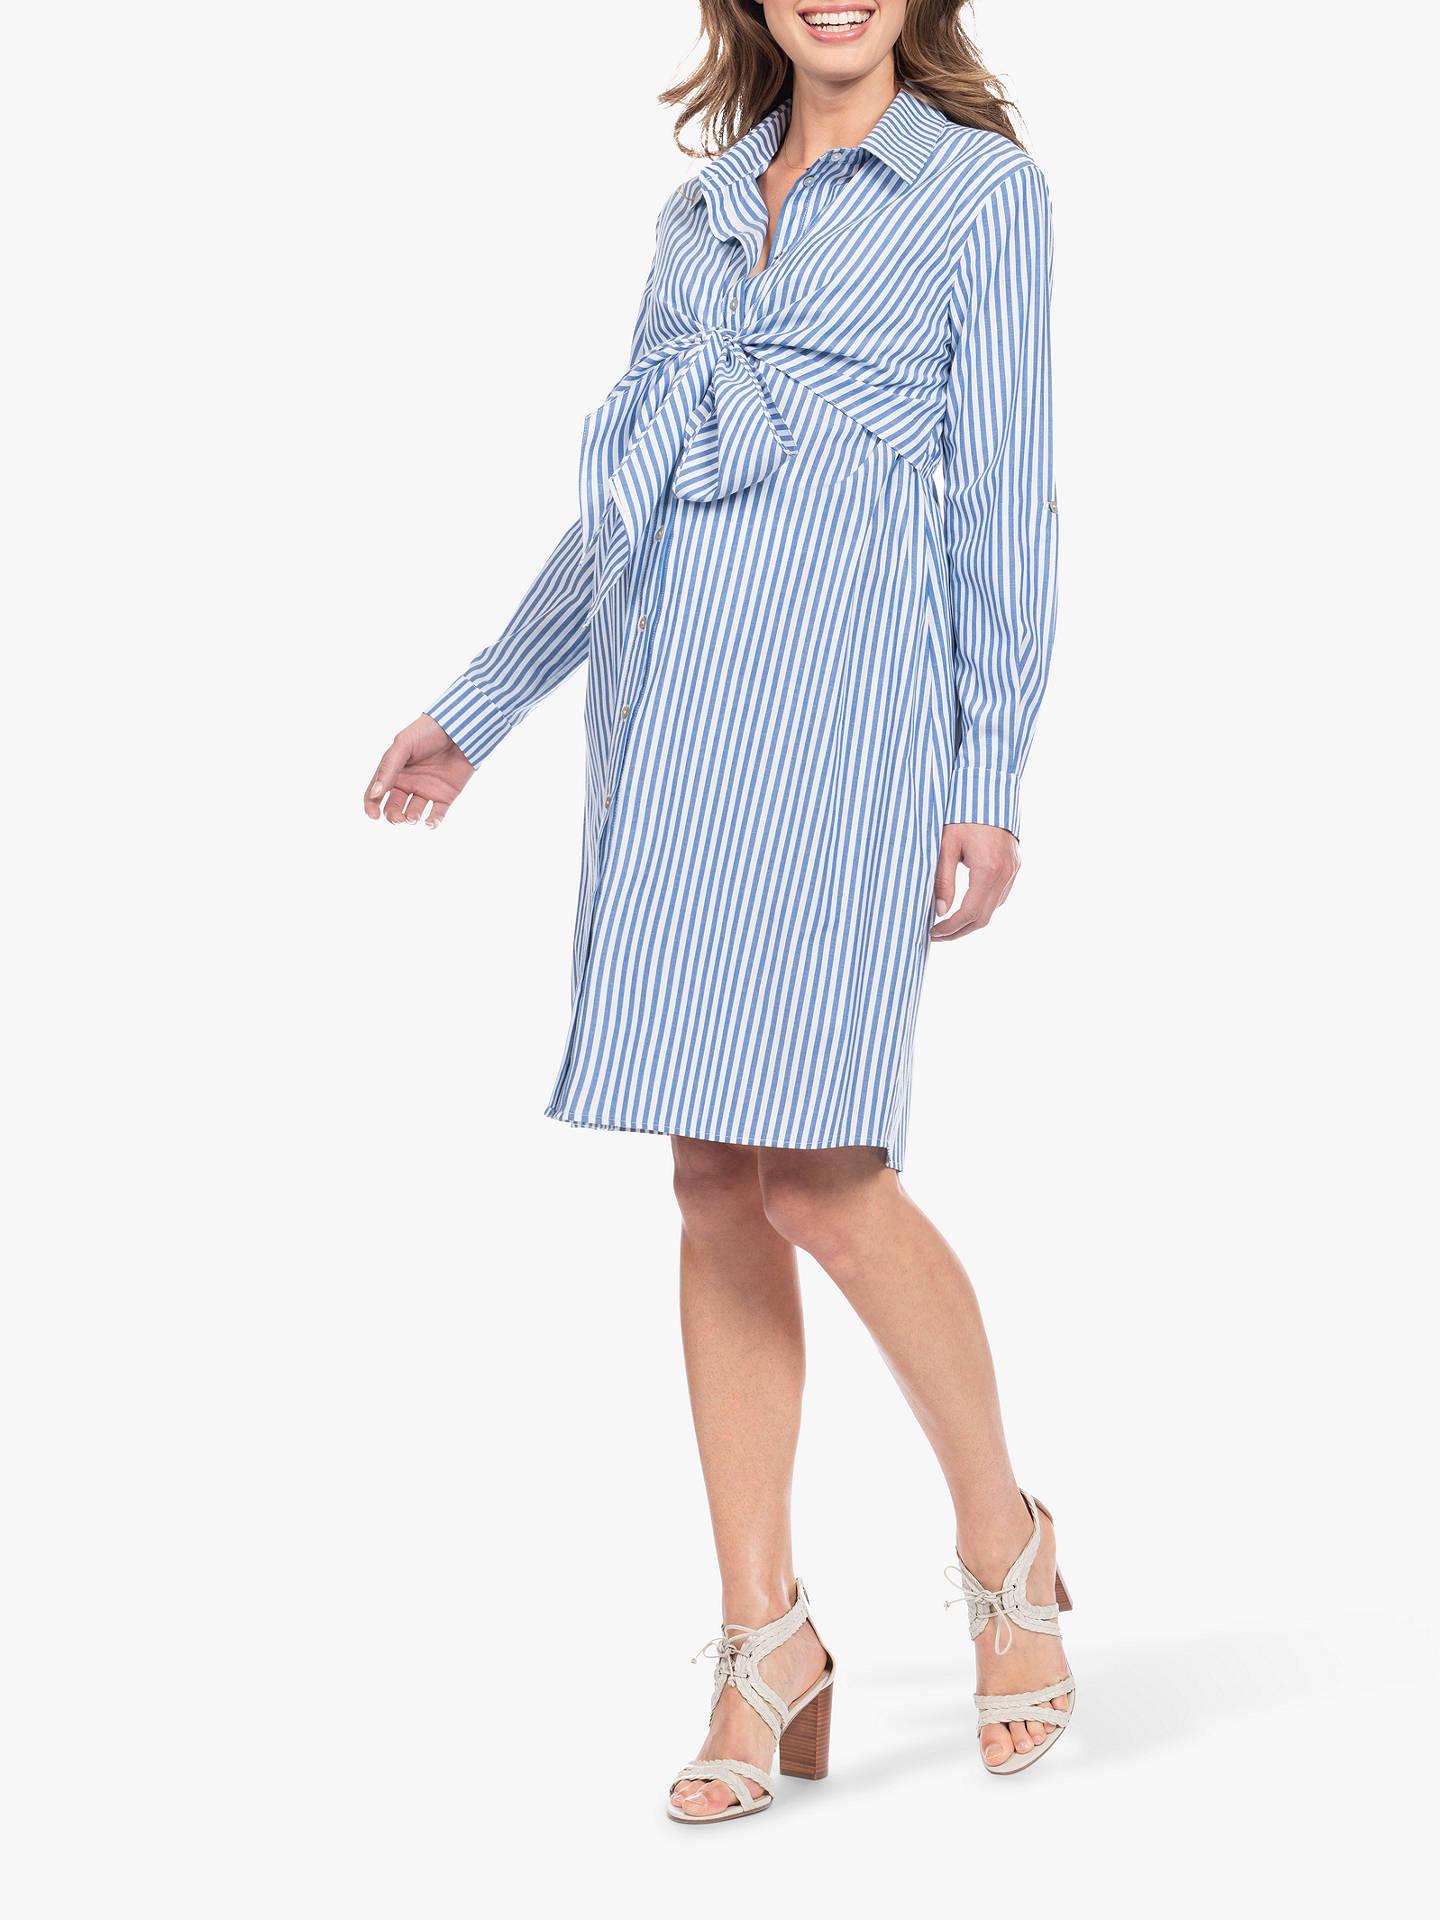 10ddc8d1b4631 ... Buy Séraphine Ariadne Stripe Shirt Maternity Nursing Dress, Blue/White,  10 Online at ...